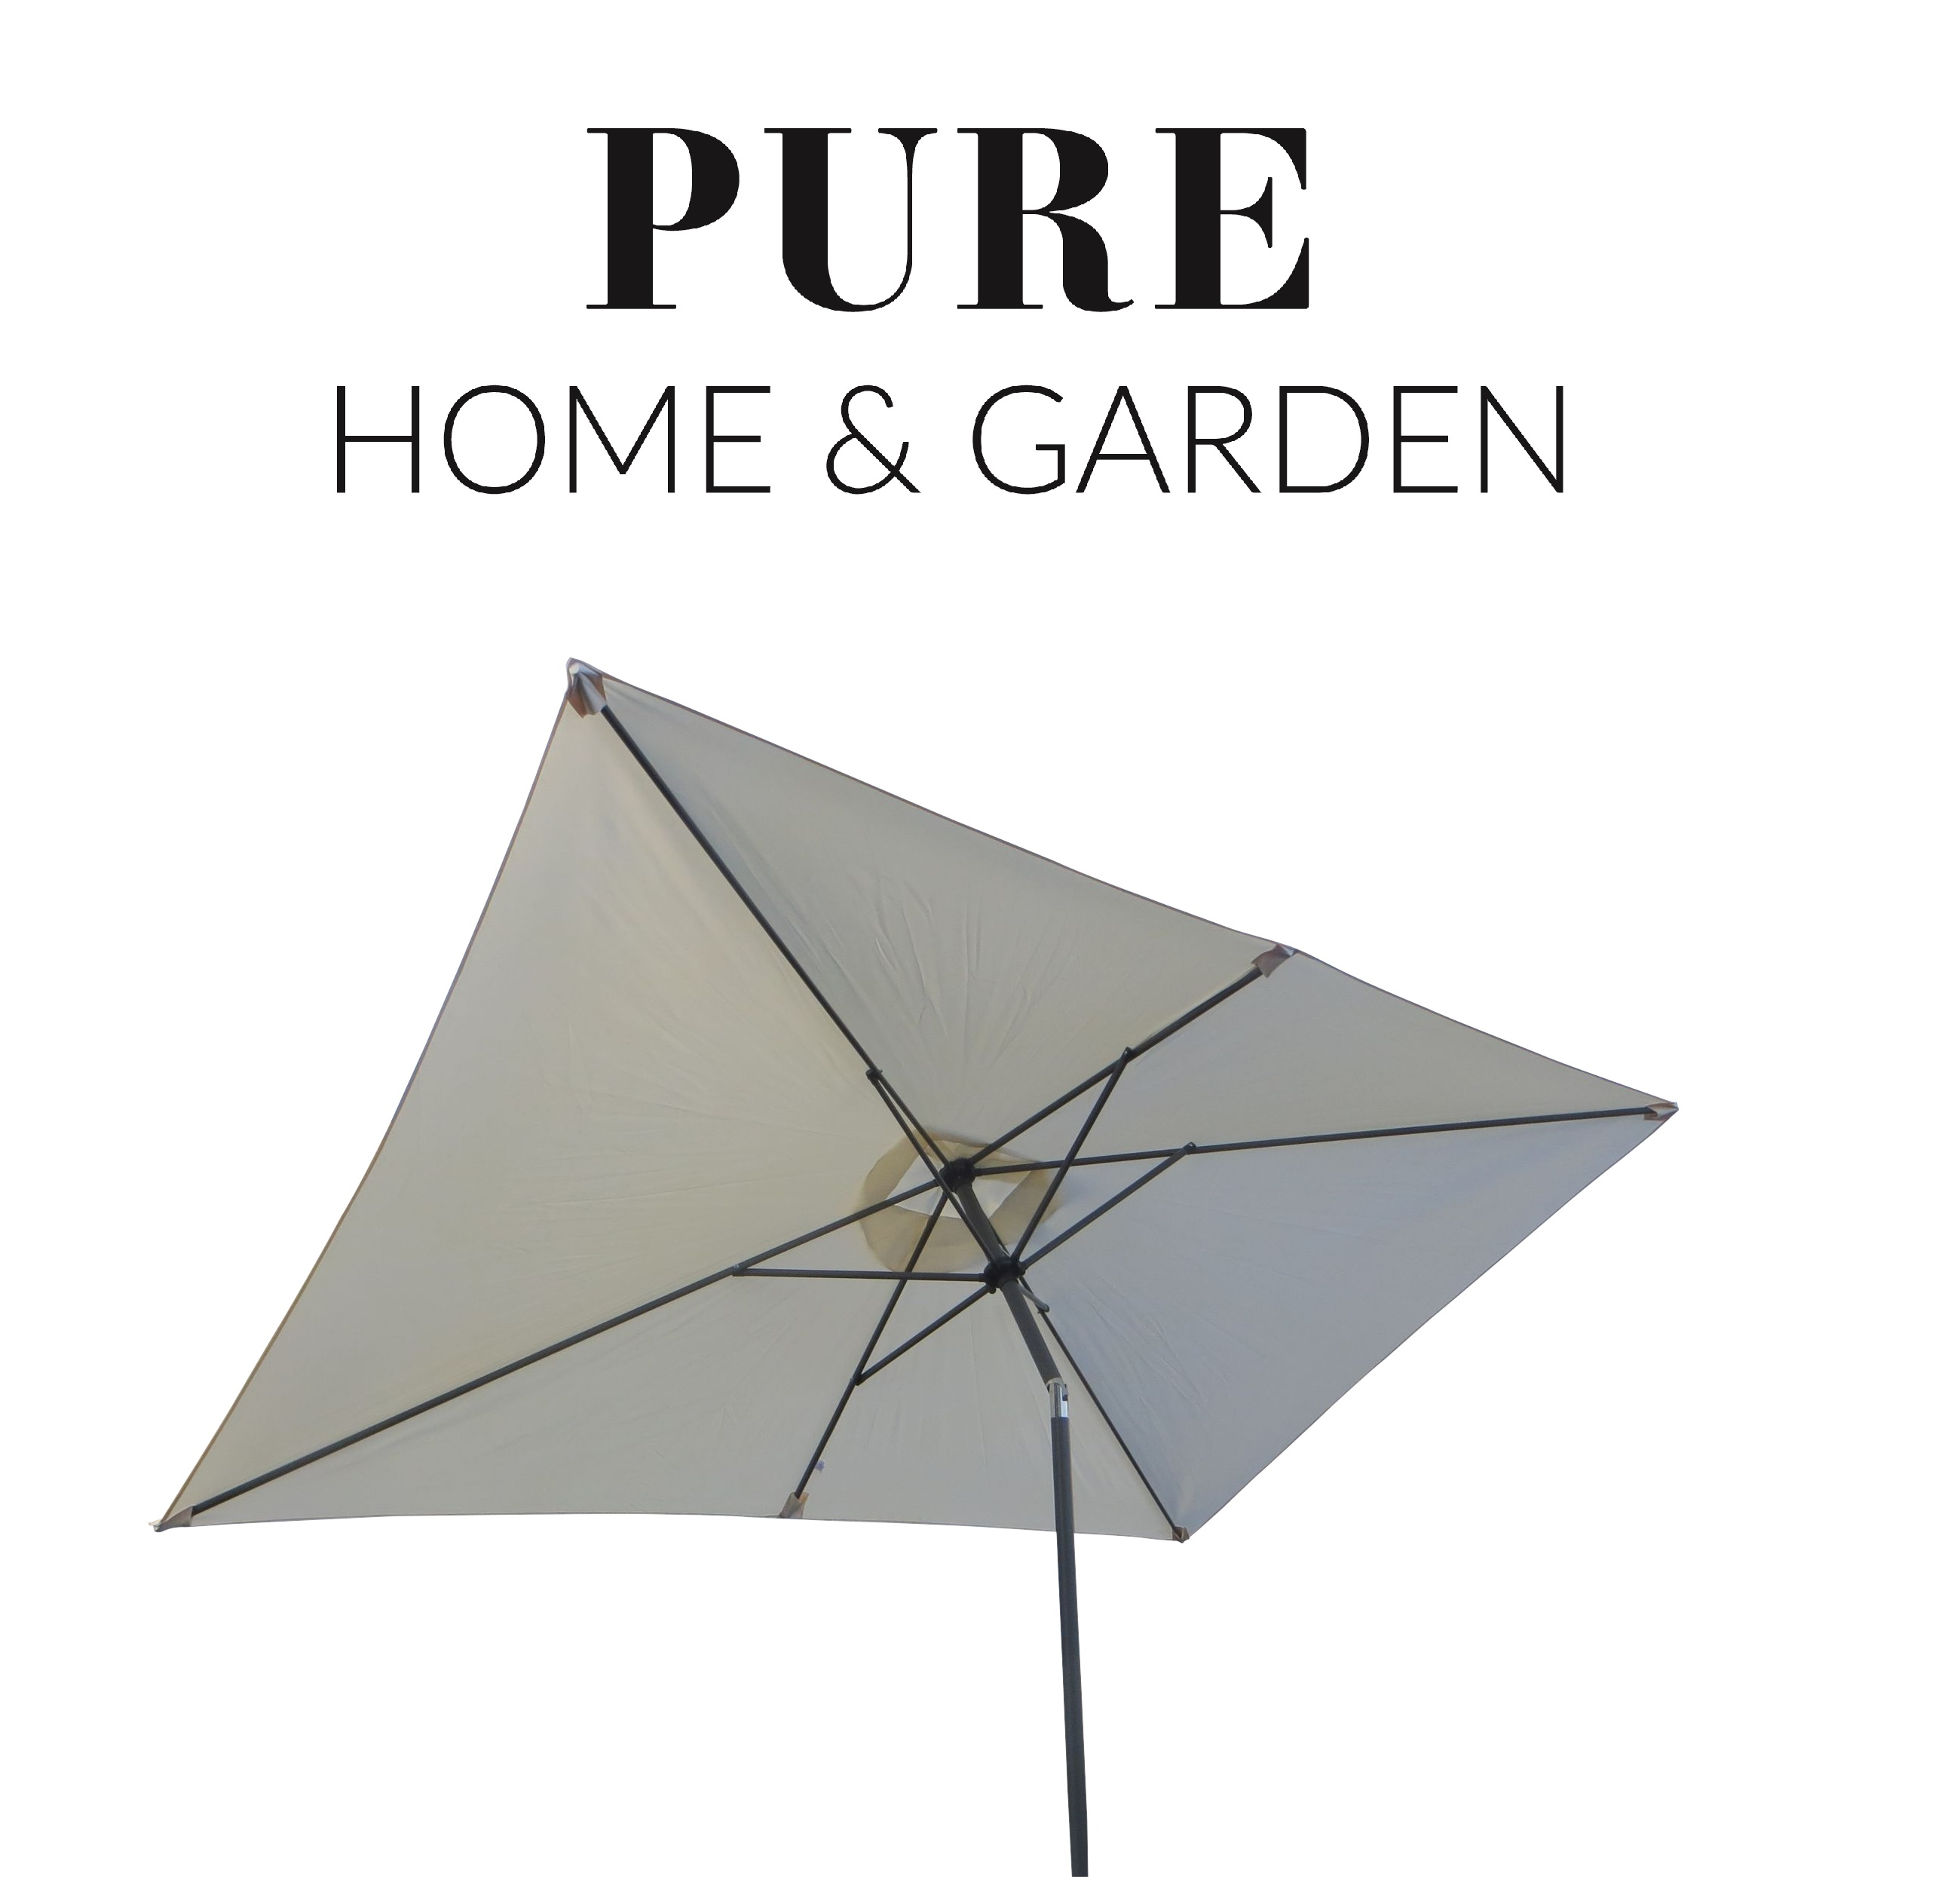 phg sonnenschirm 300x200cm kurbelschirm eckig natur sonnenschirme sonnenschutz garten. Black Bedroom Furniture Sets. Home Design Ideas